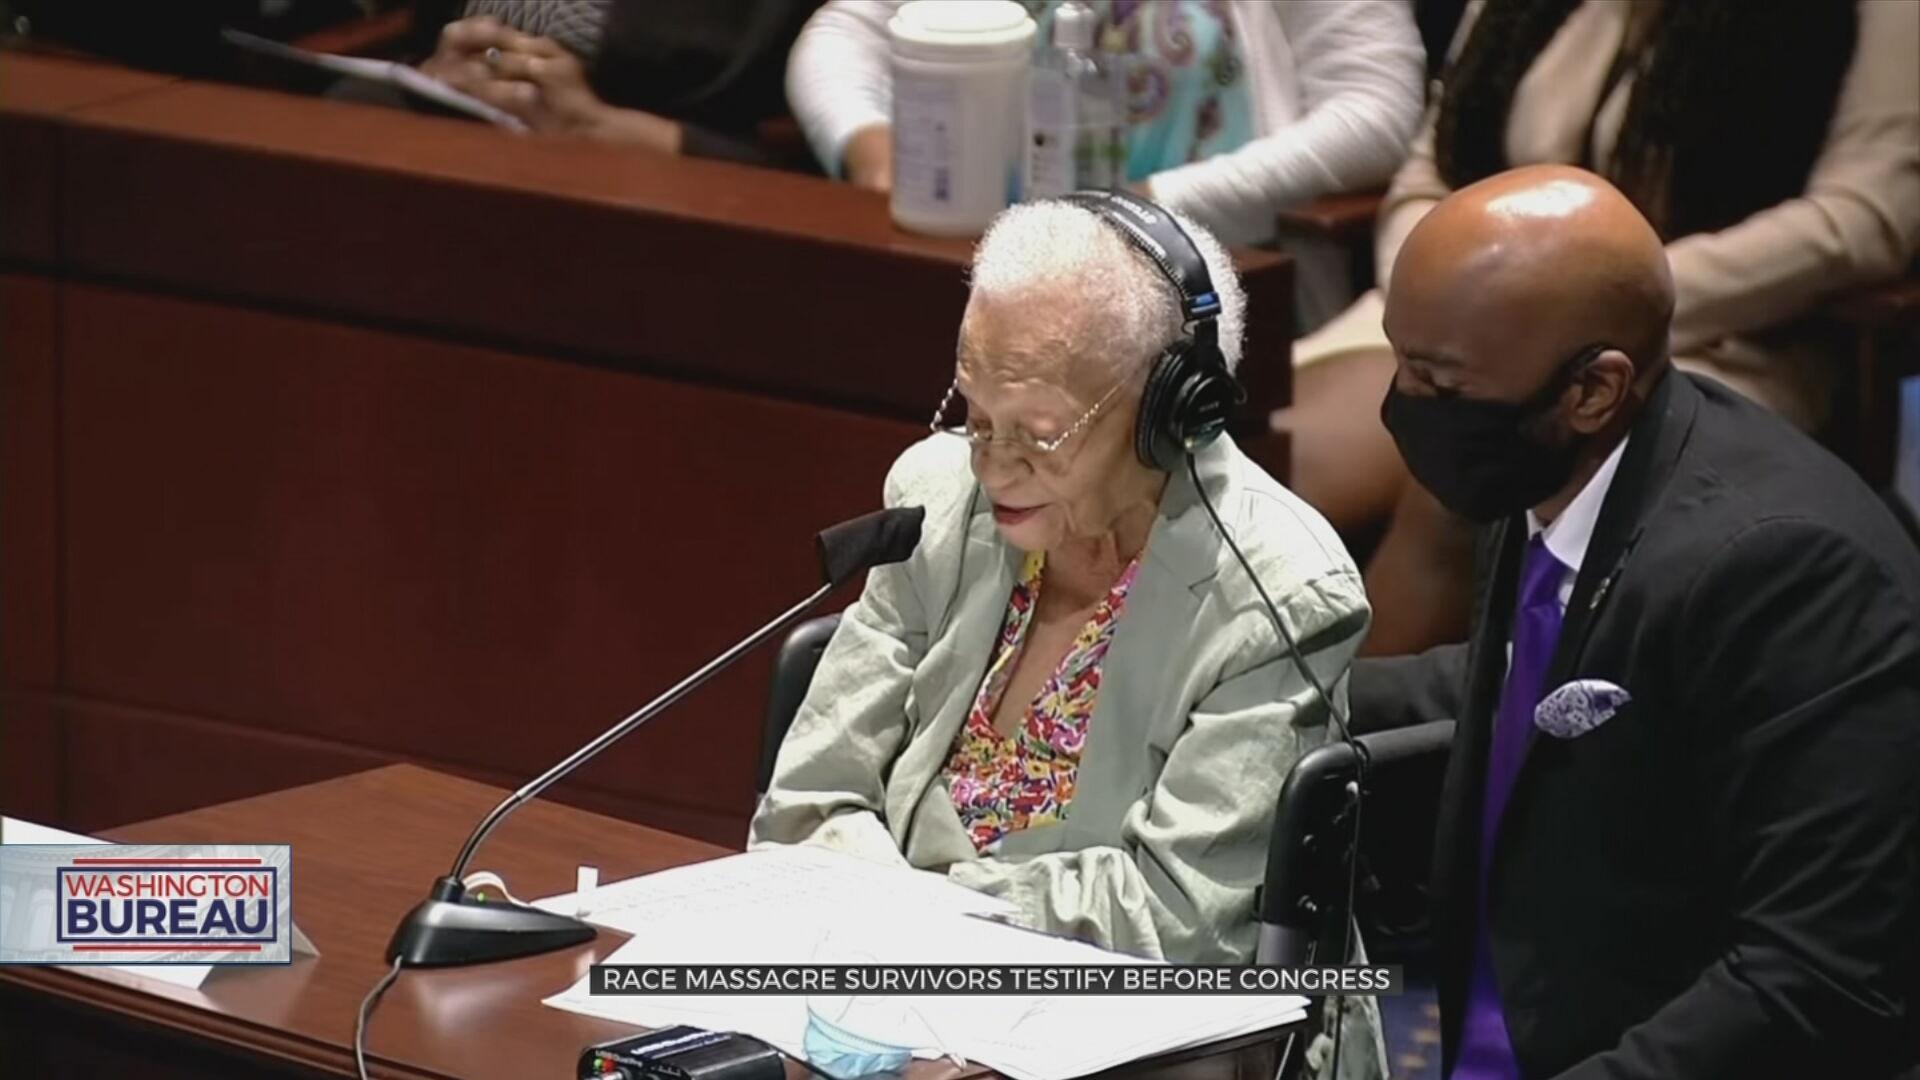 Tulsa Race Massacre Survivors Plead For Justice, Reparations In Washington